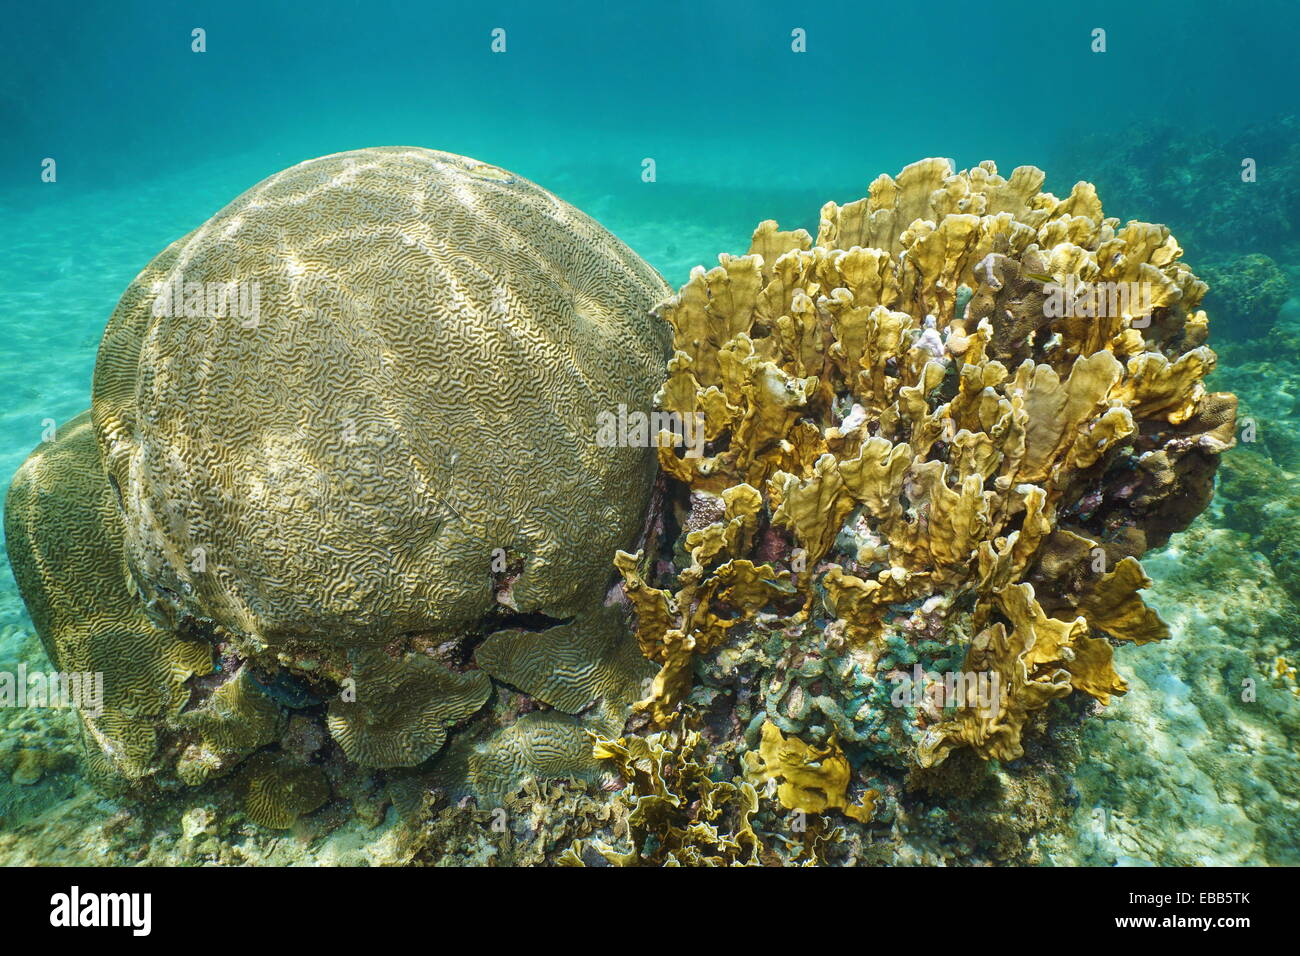 Symmetrical brain coral, Diploria strigosa and bladed fire coral, Millepora complanata, Grand Bahamas, Atlantic - Stock Image